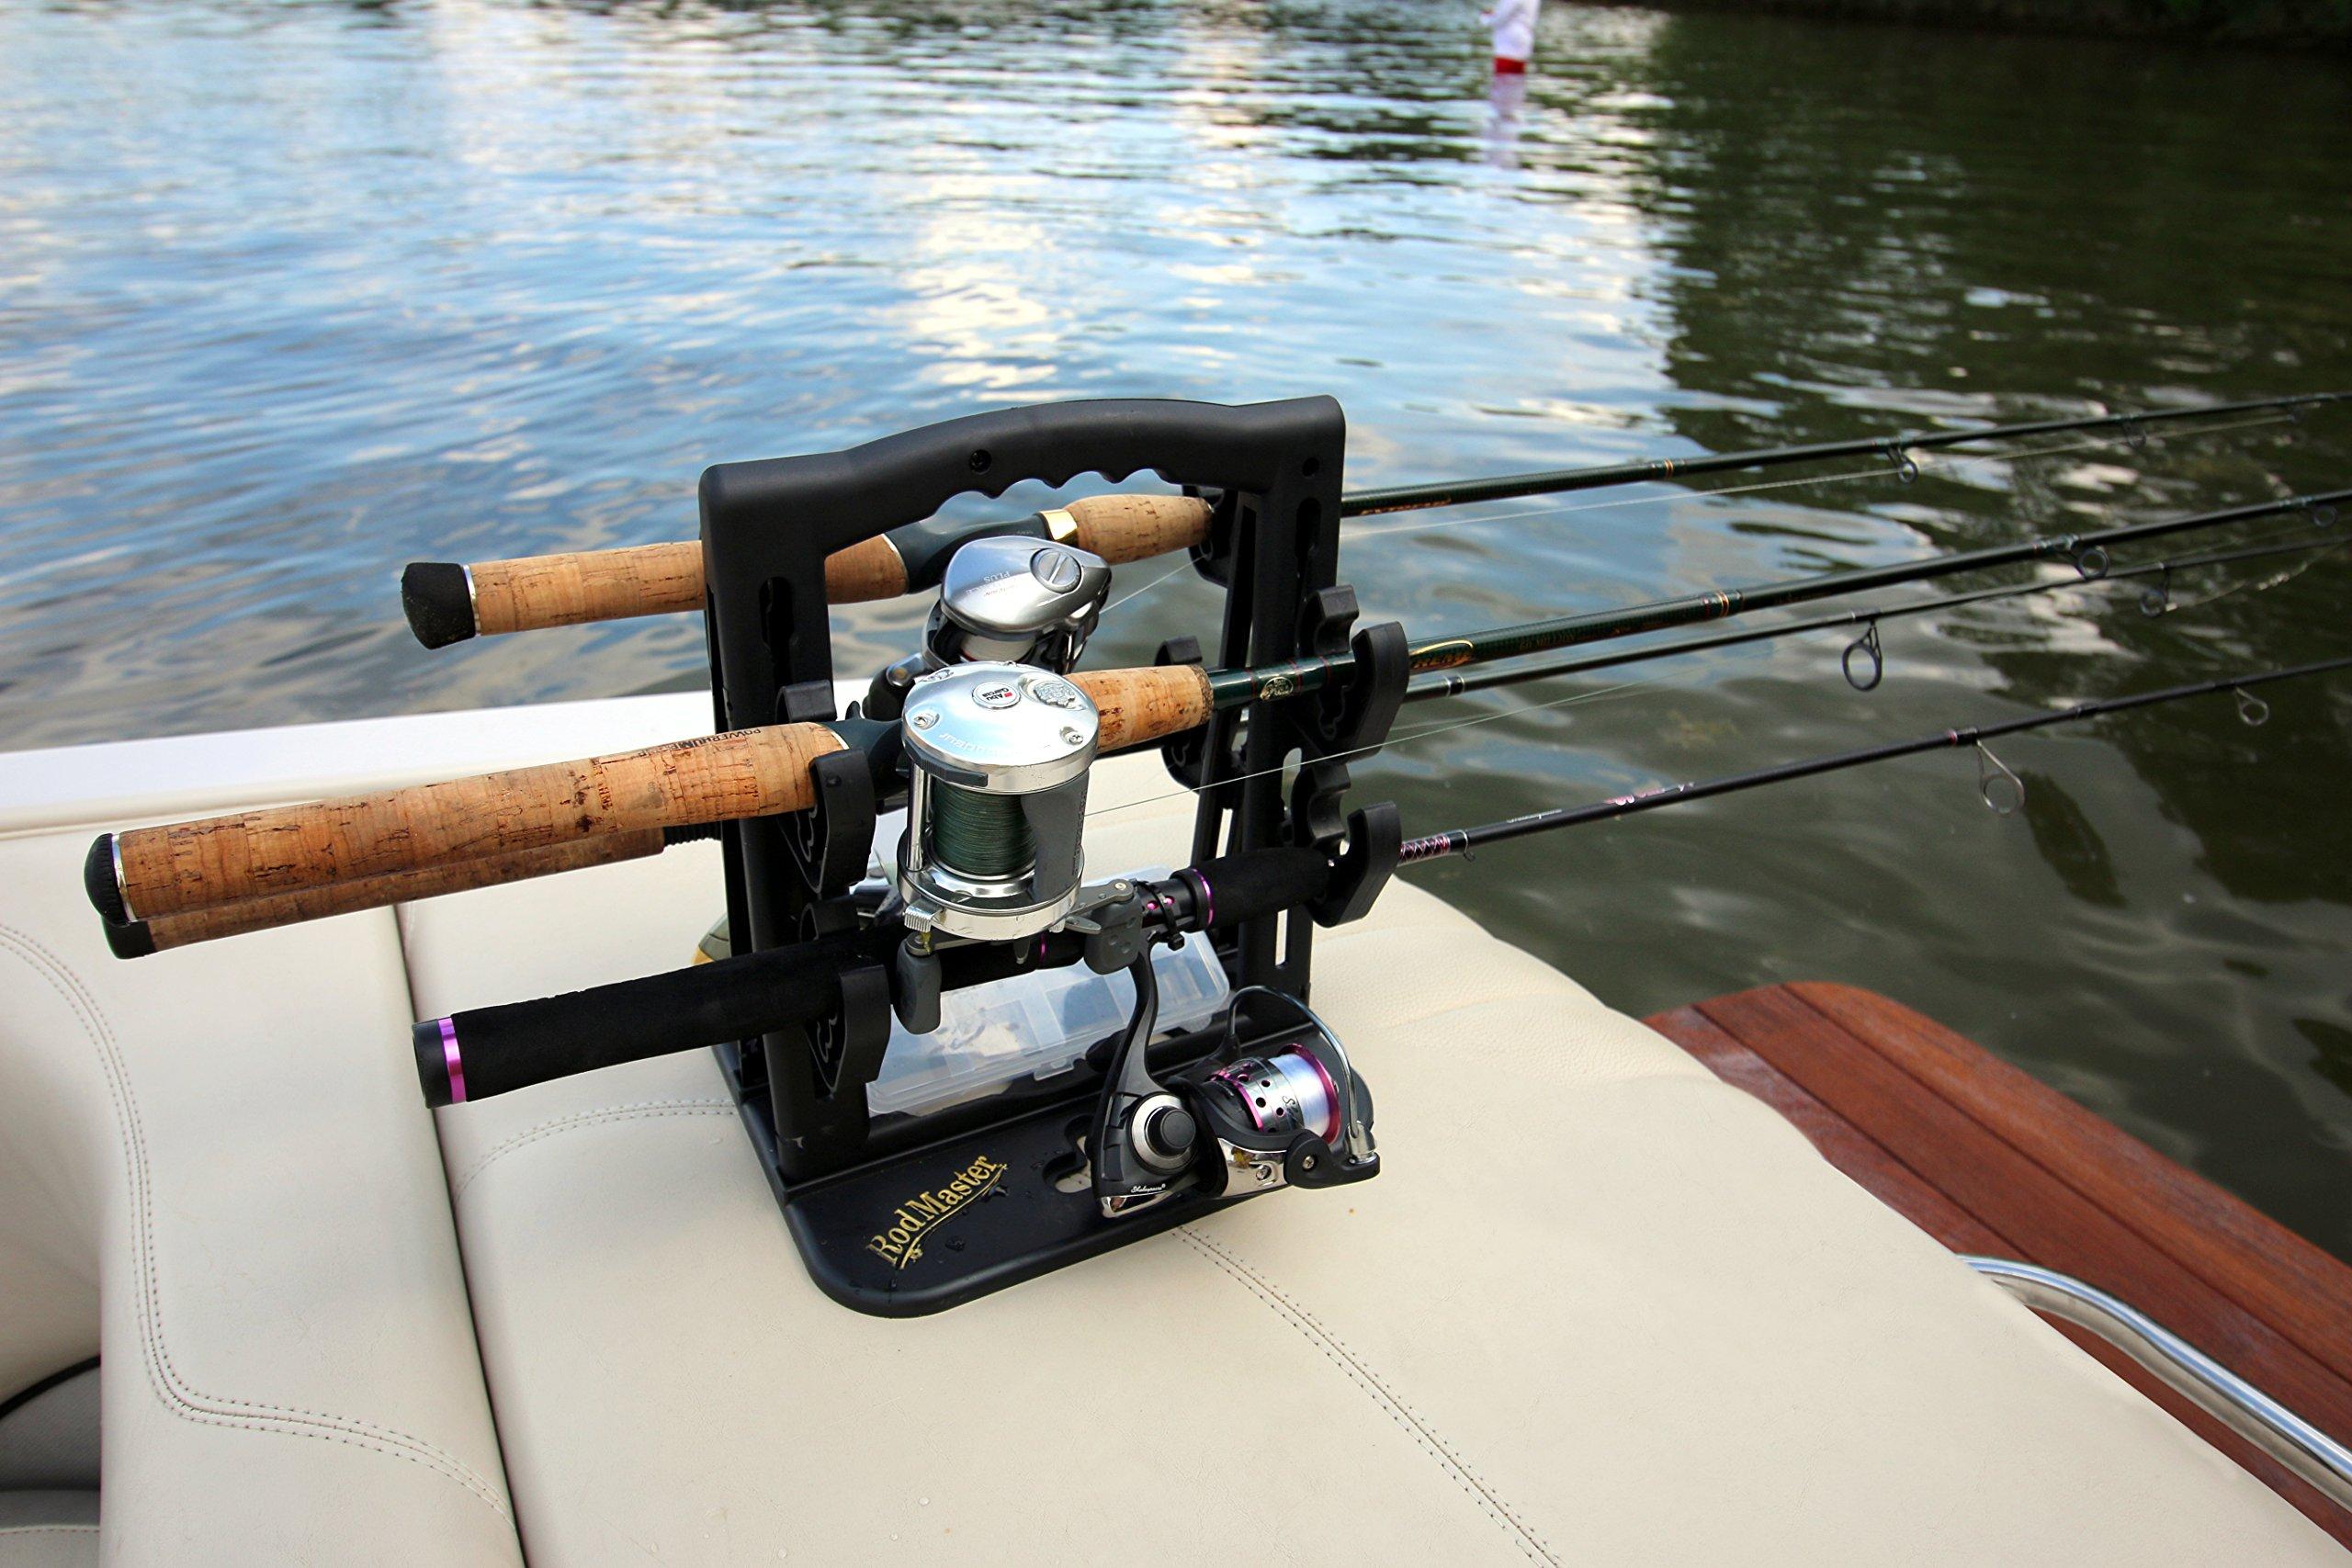 Rodmaster Rod Caddy, Rod Carrier, Fishing Rod Rack